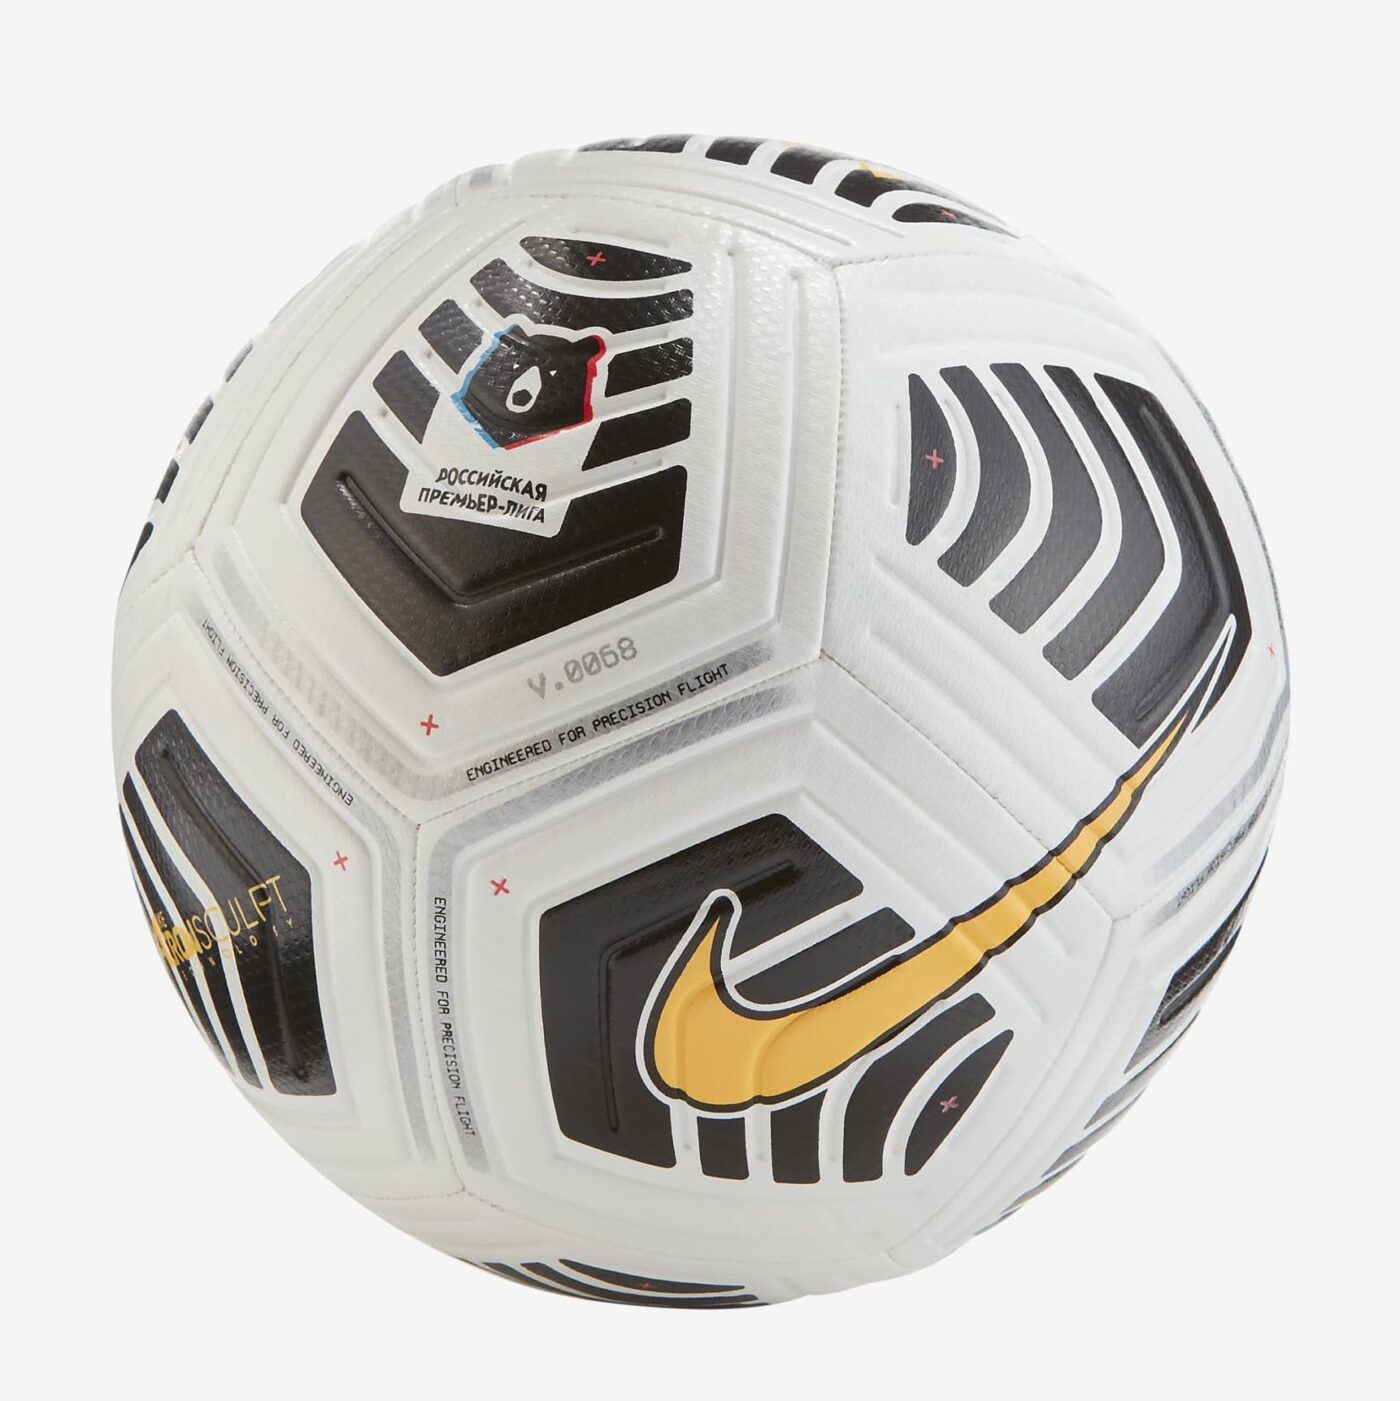 Ballon championnat Russie - Nike